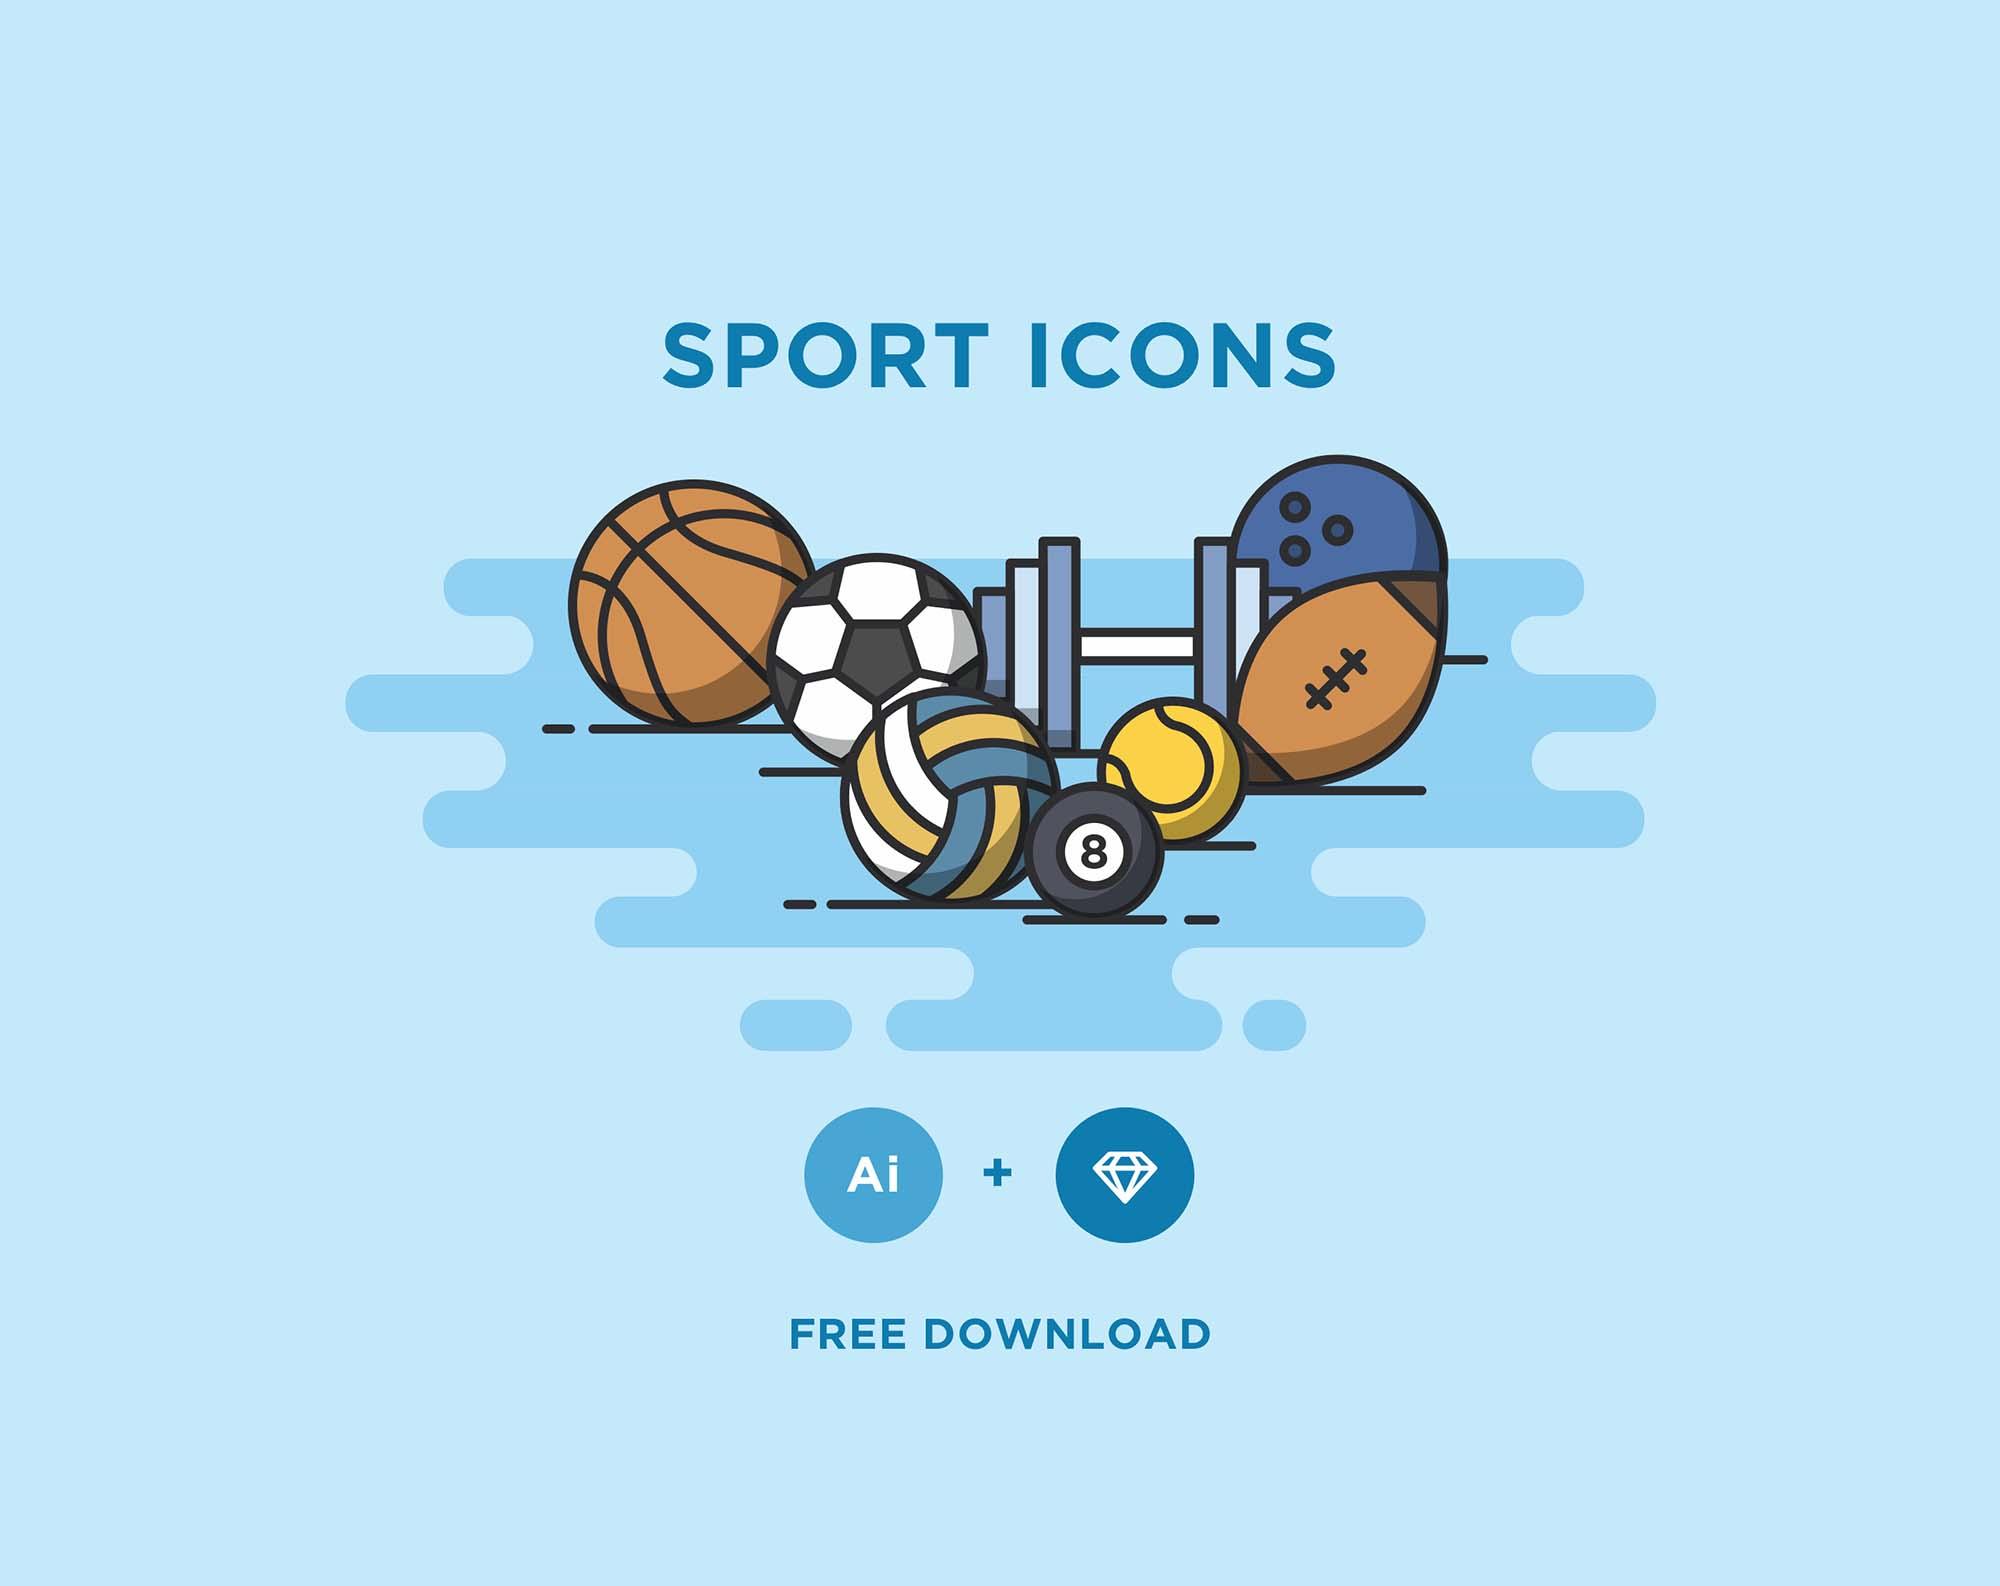 12 Sport Icons